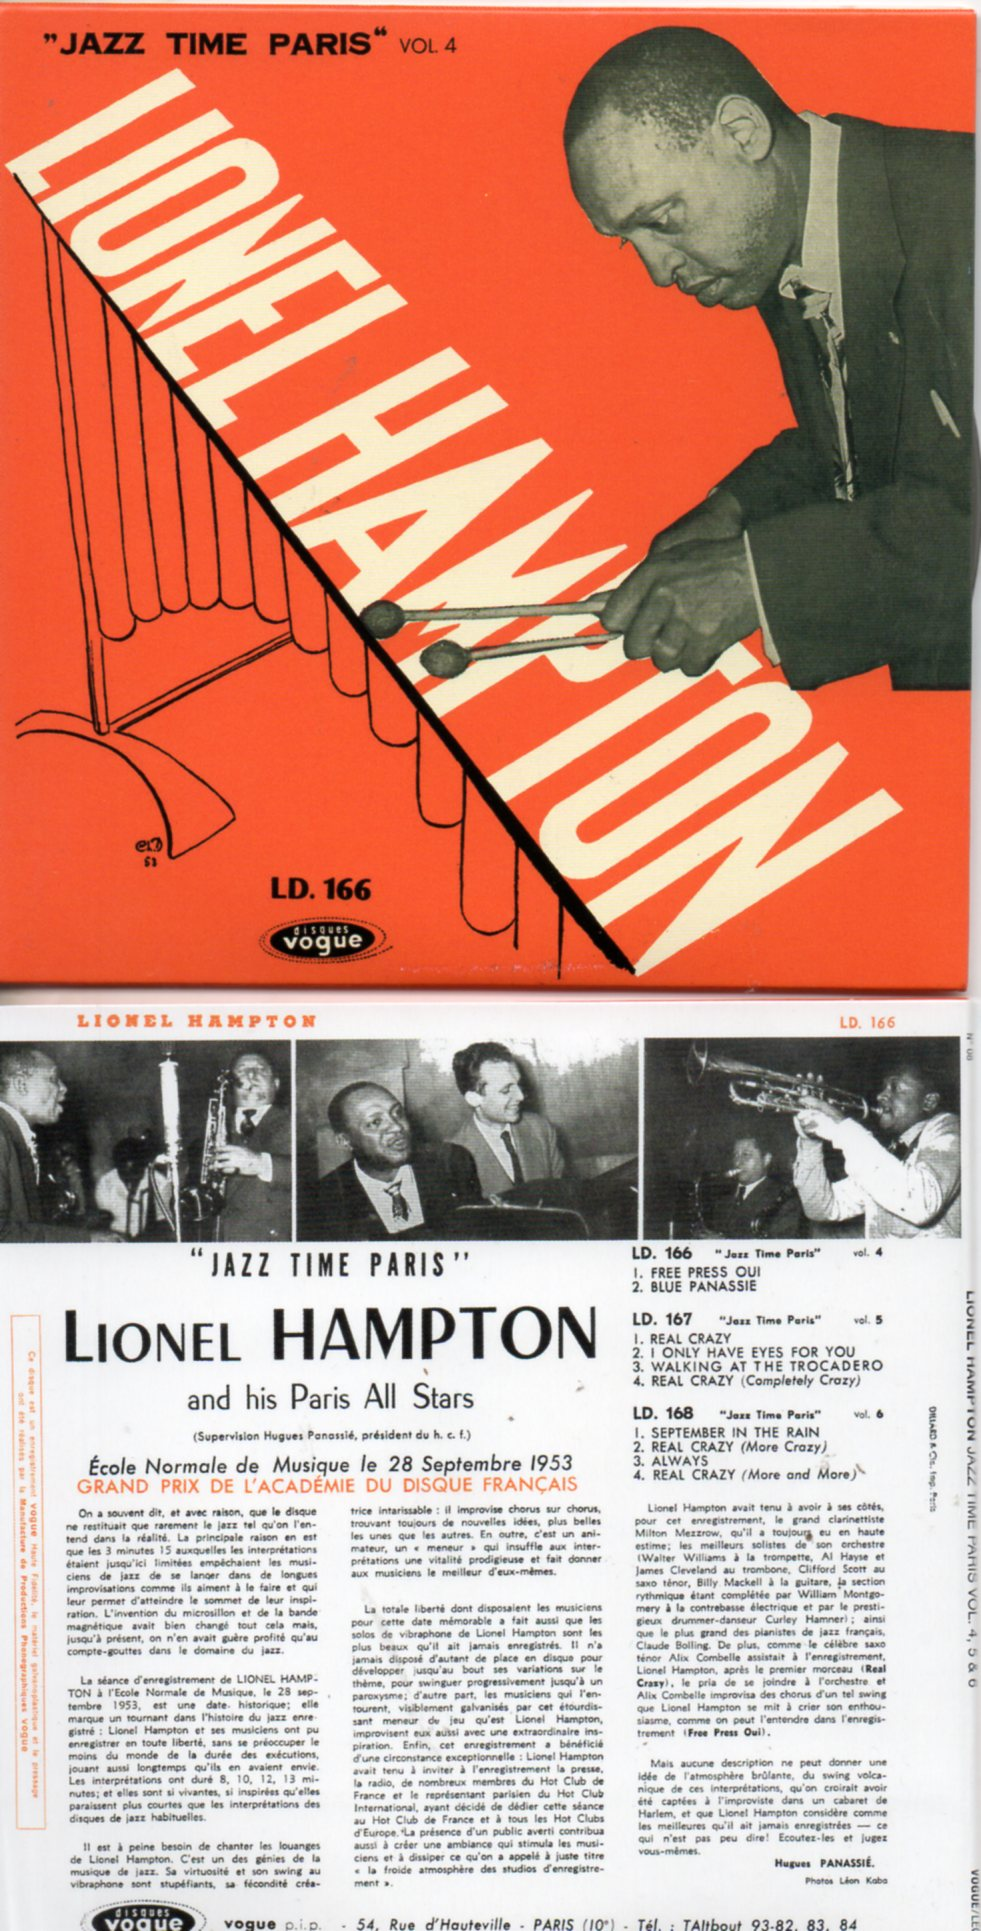 LIONEL HAMPTON - Jazz Time Paris Vol. 4, 5 & 6 (1953) - MINI LP REPLICA CARD SLEEVE - 10-TRACK - CD